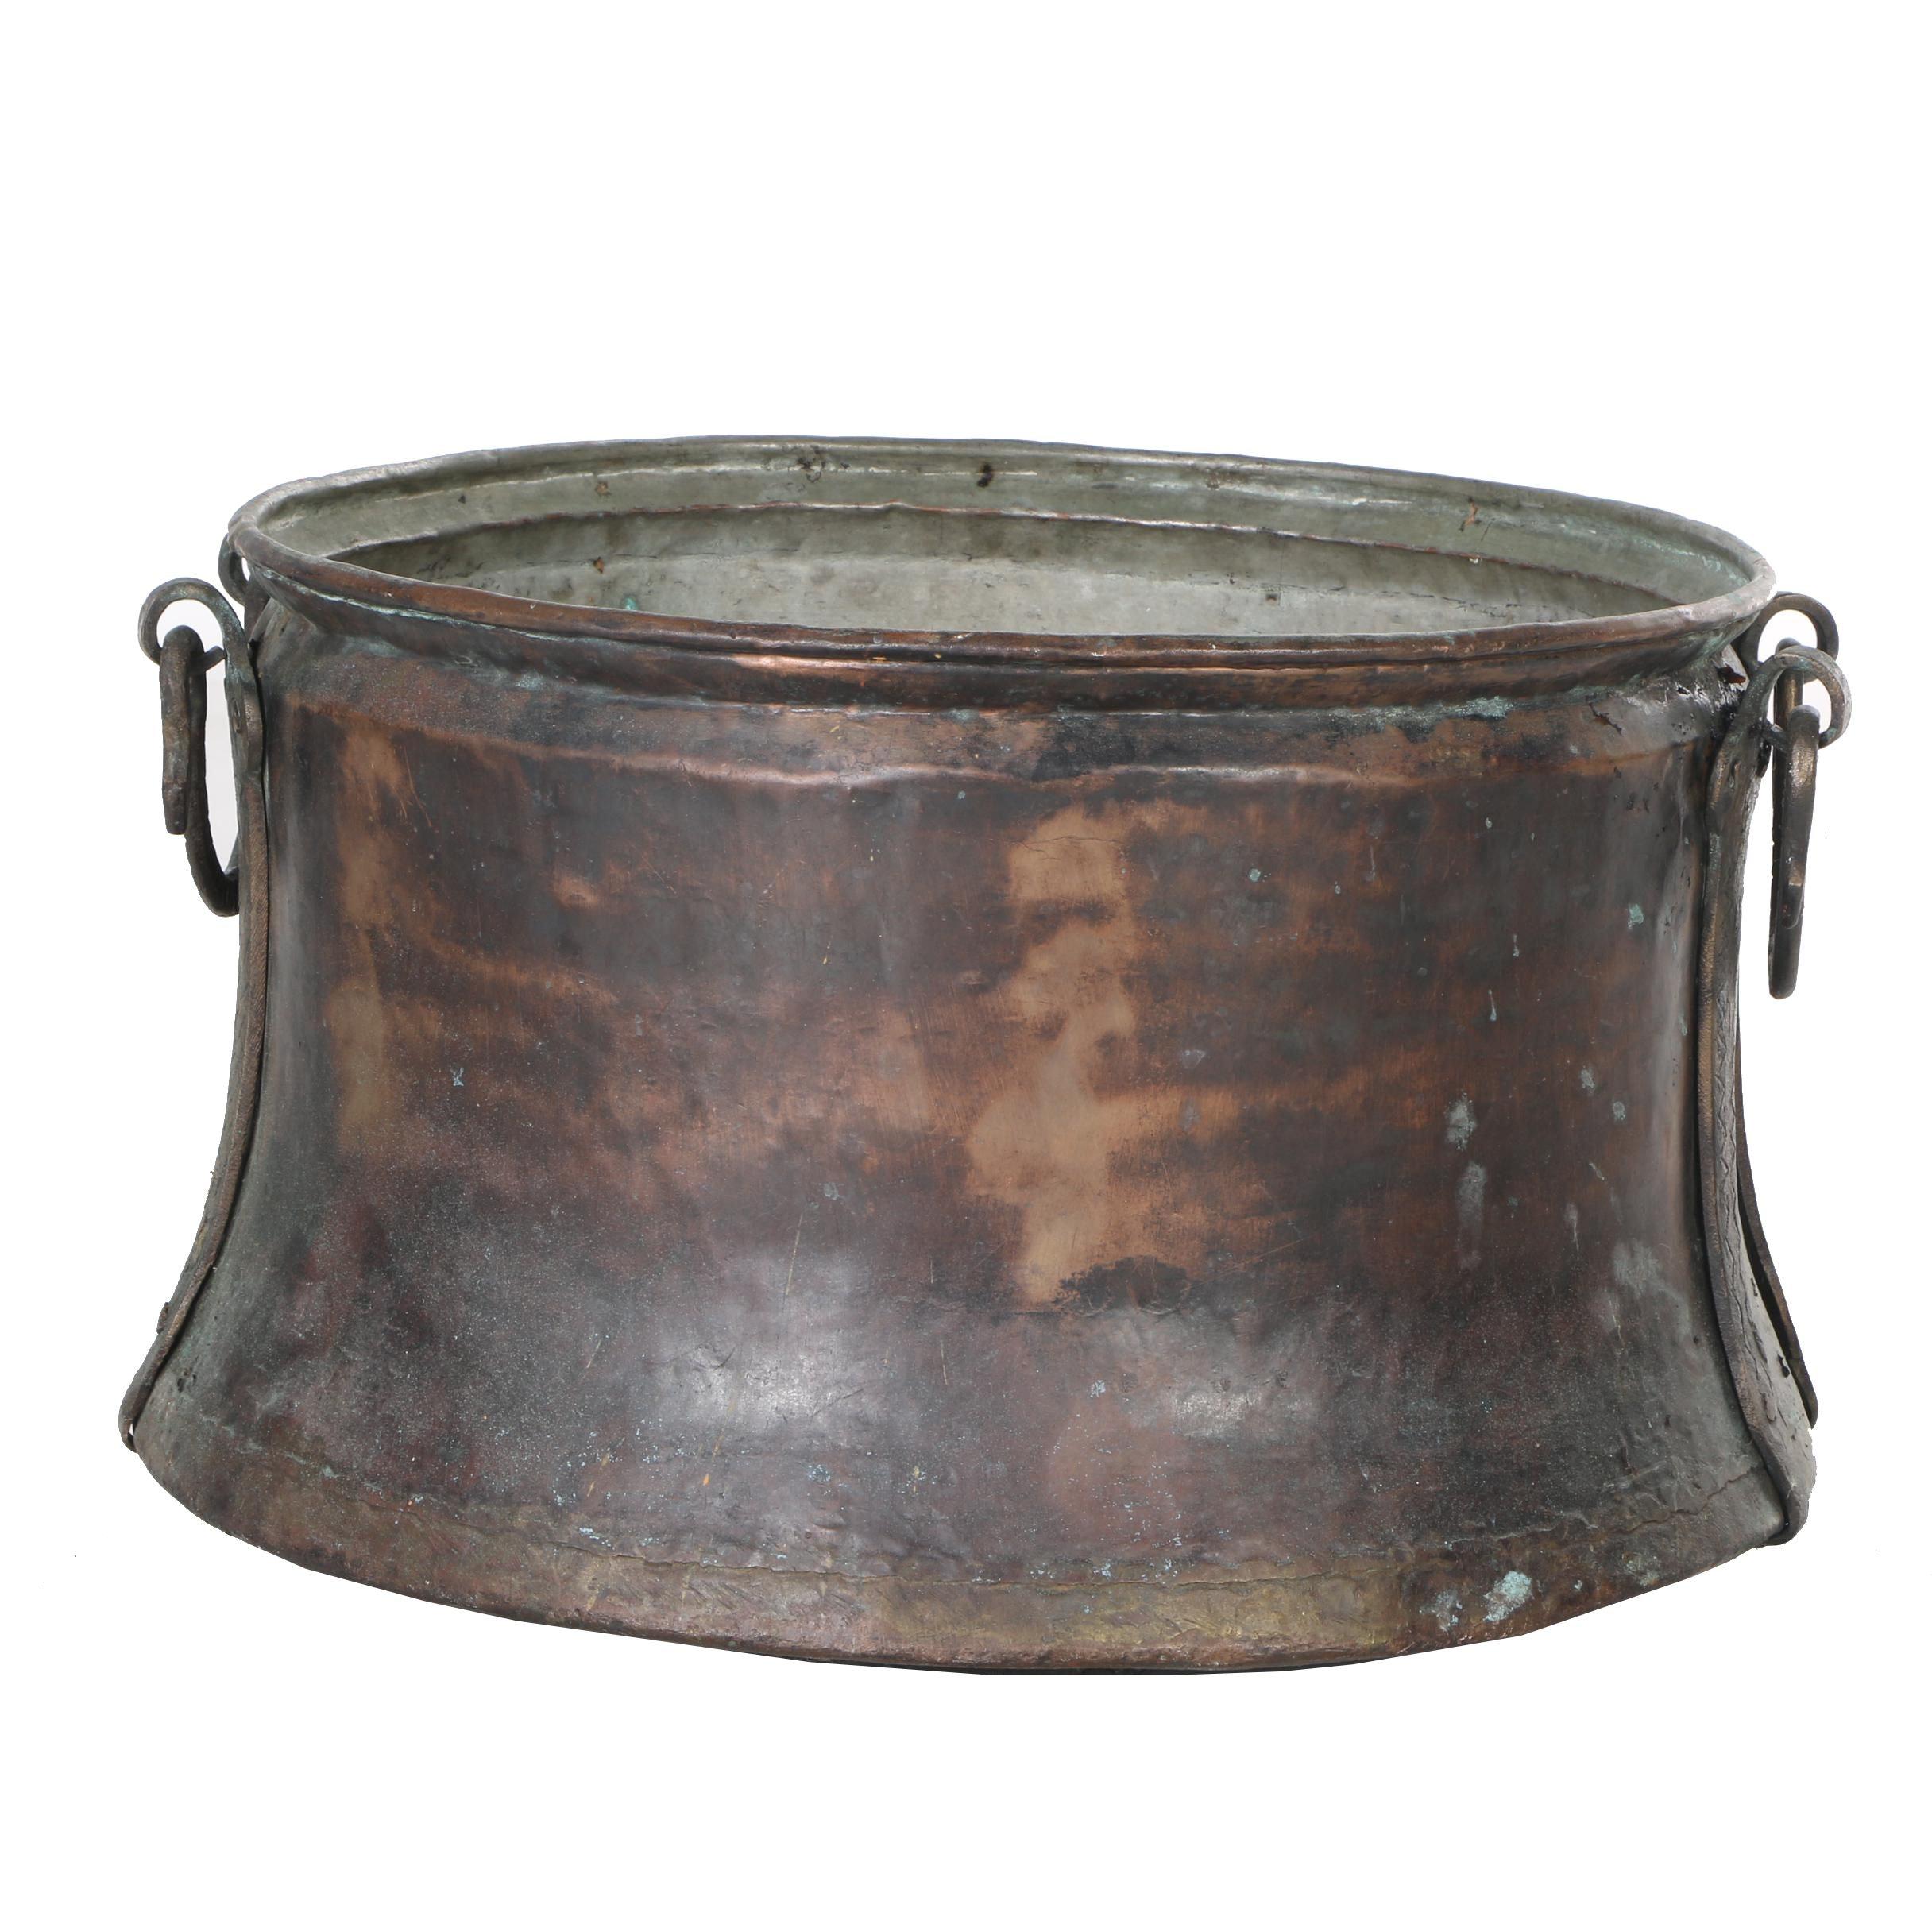 Copper Bucket with Brass Handles